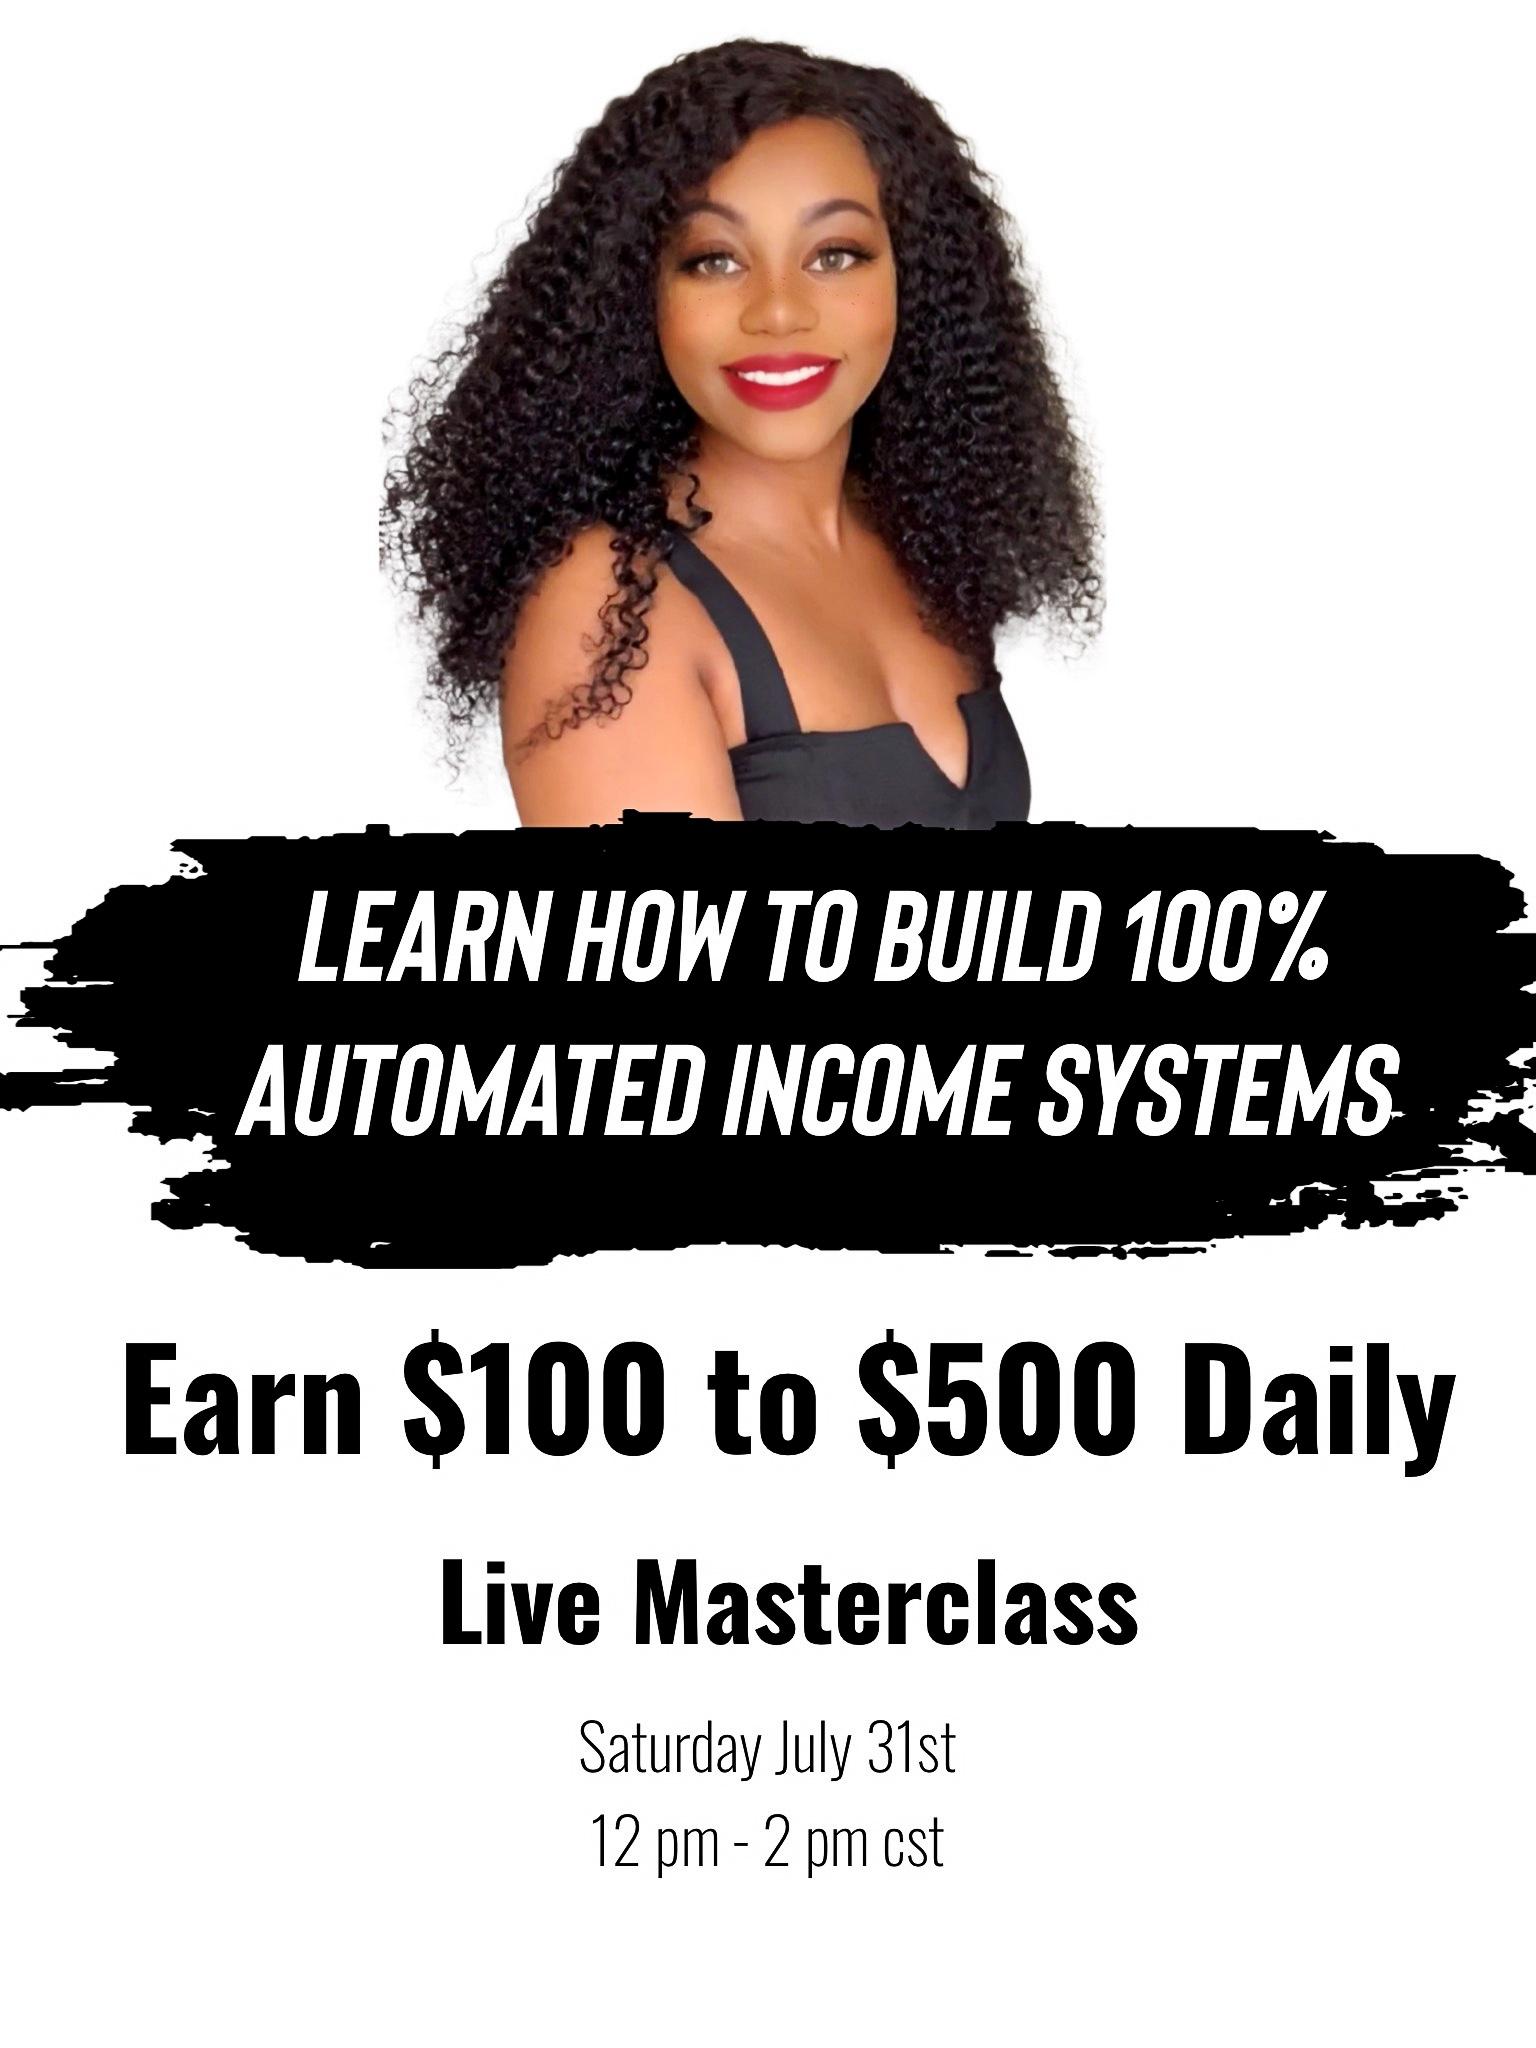 MasterProfitz - 100% Automated Income Systems